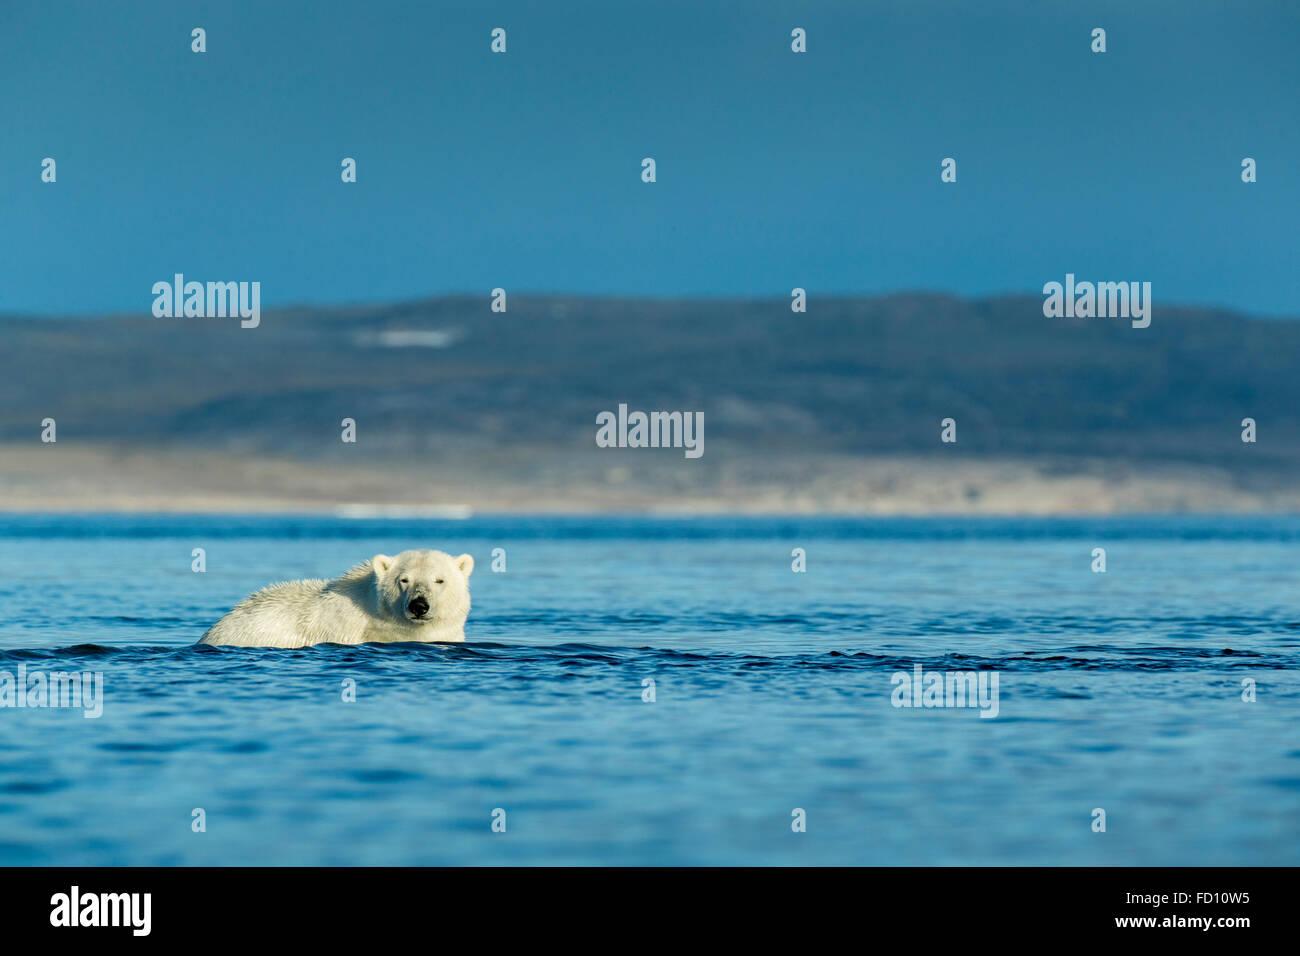 Canada, Nunavut Territory, Repulse Bay, Polar Bear (Ursus maritimus) wading into shallows along Hudson Bay shoreline - Stock Image